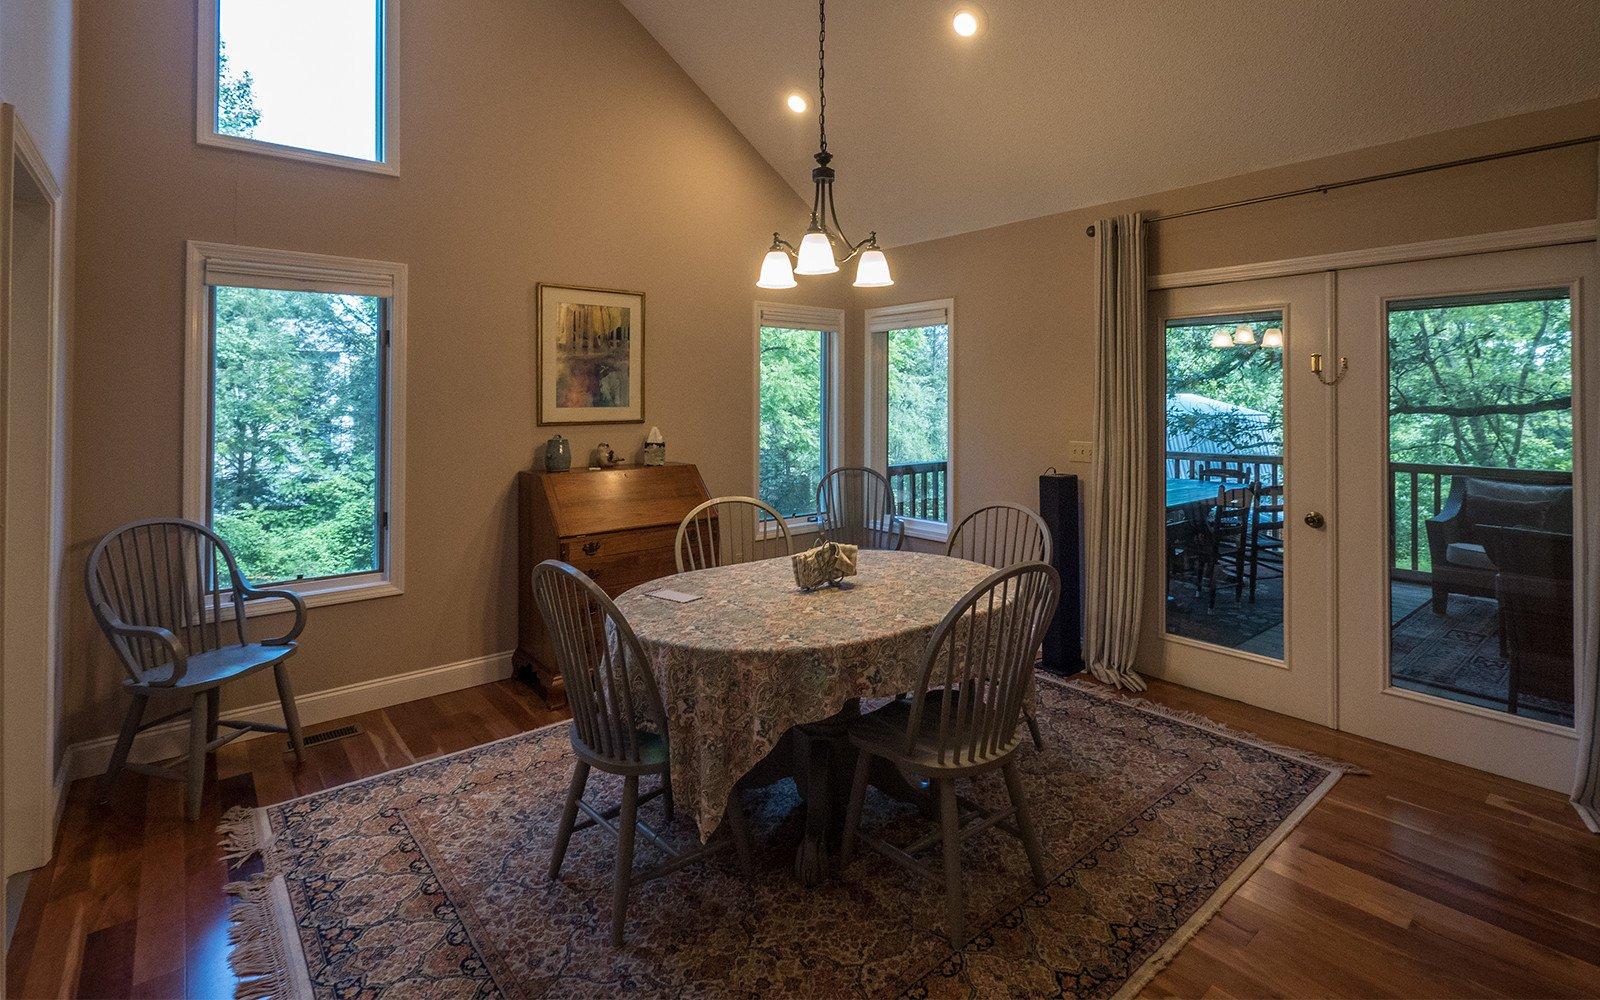 Hilt-Street-house-dining-room